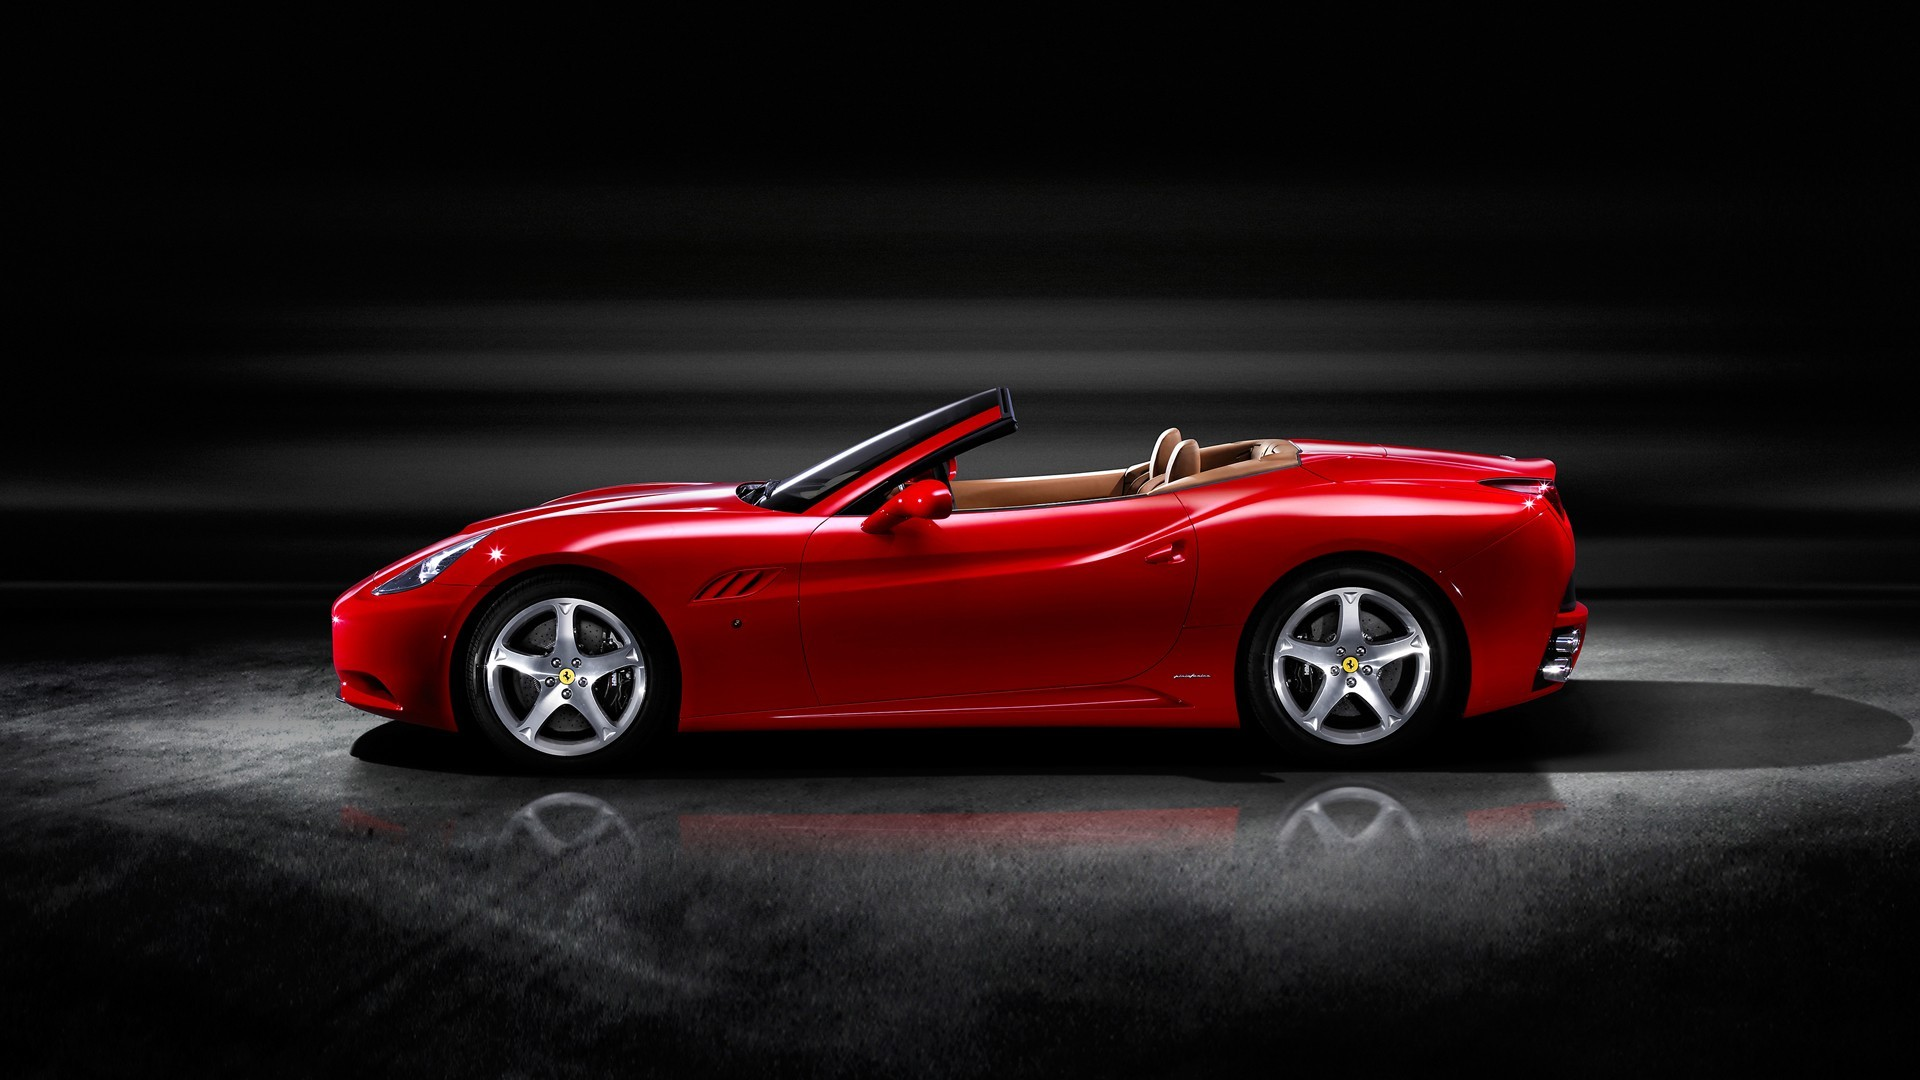 General 1920x1080 Ferrari California Ferrari red cars car vehicle